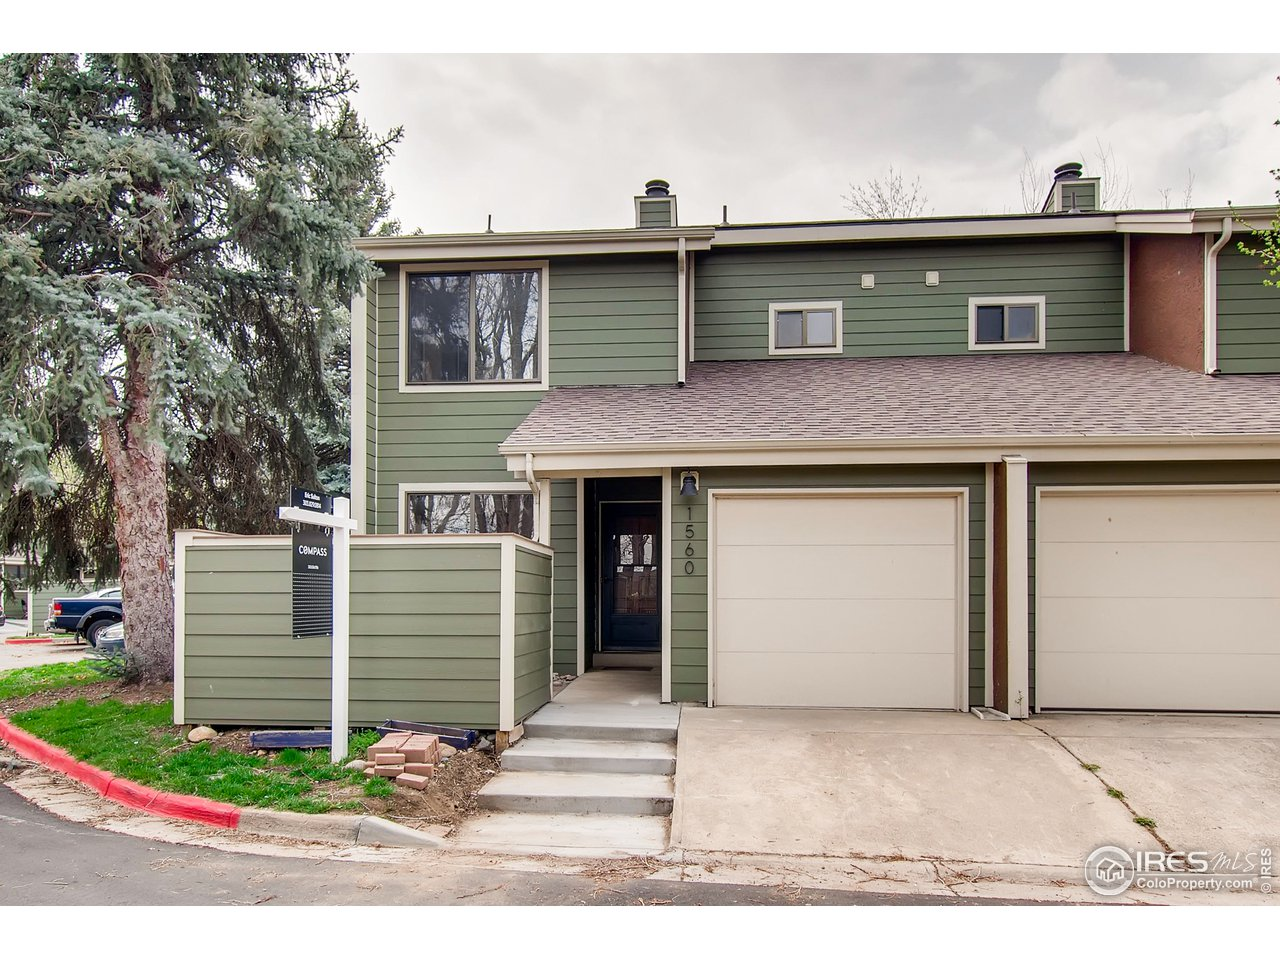 1560 Macarthur Dr, Boulder CO 80303